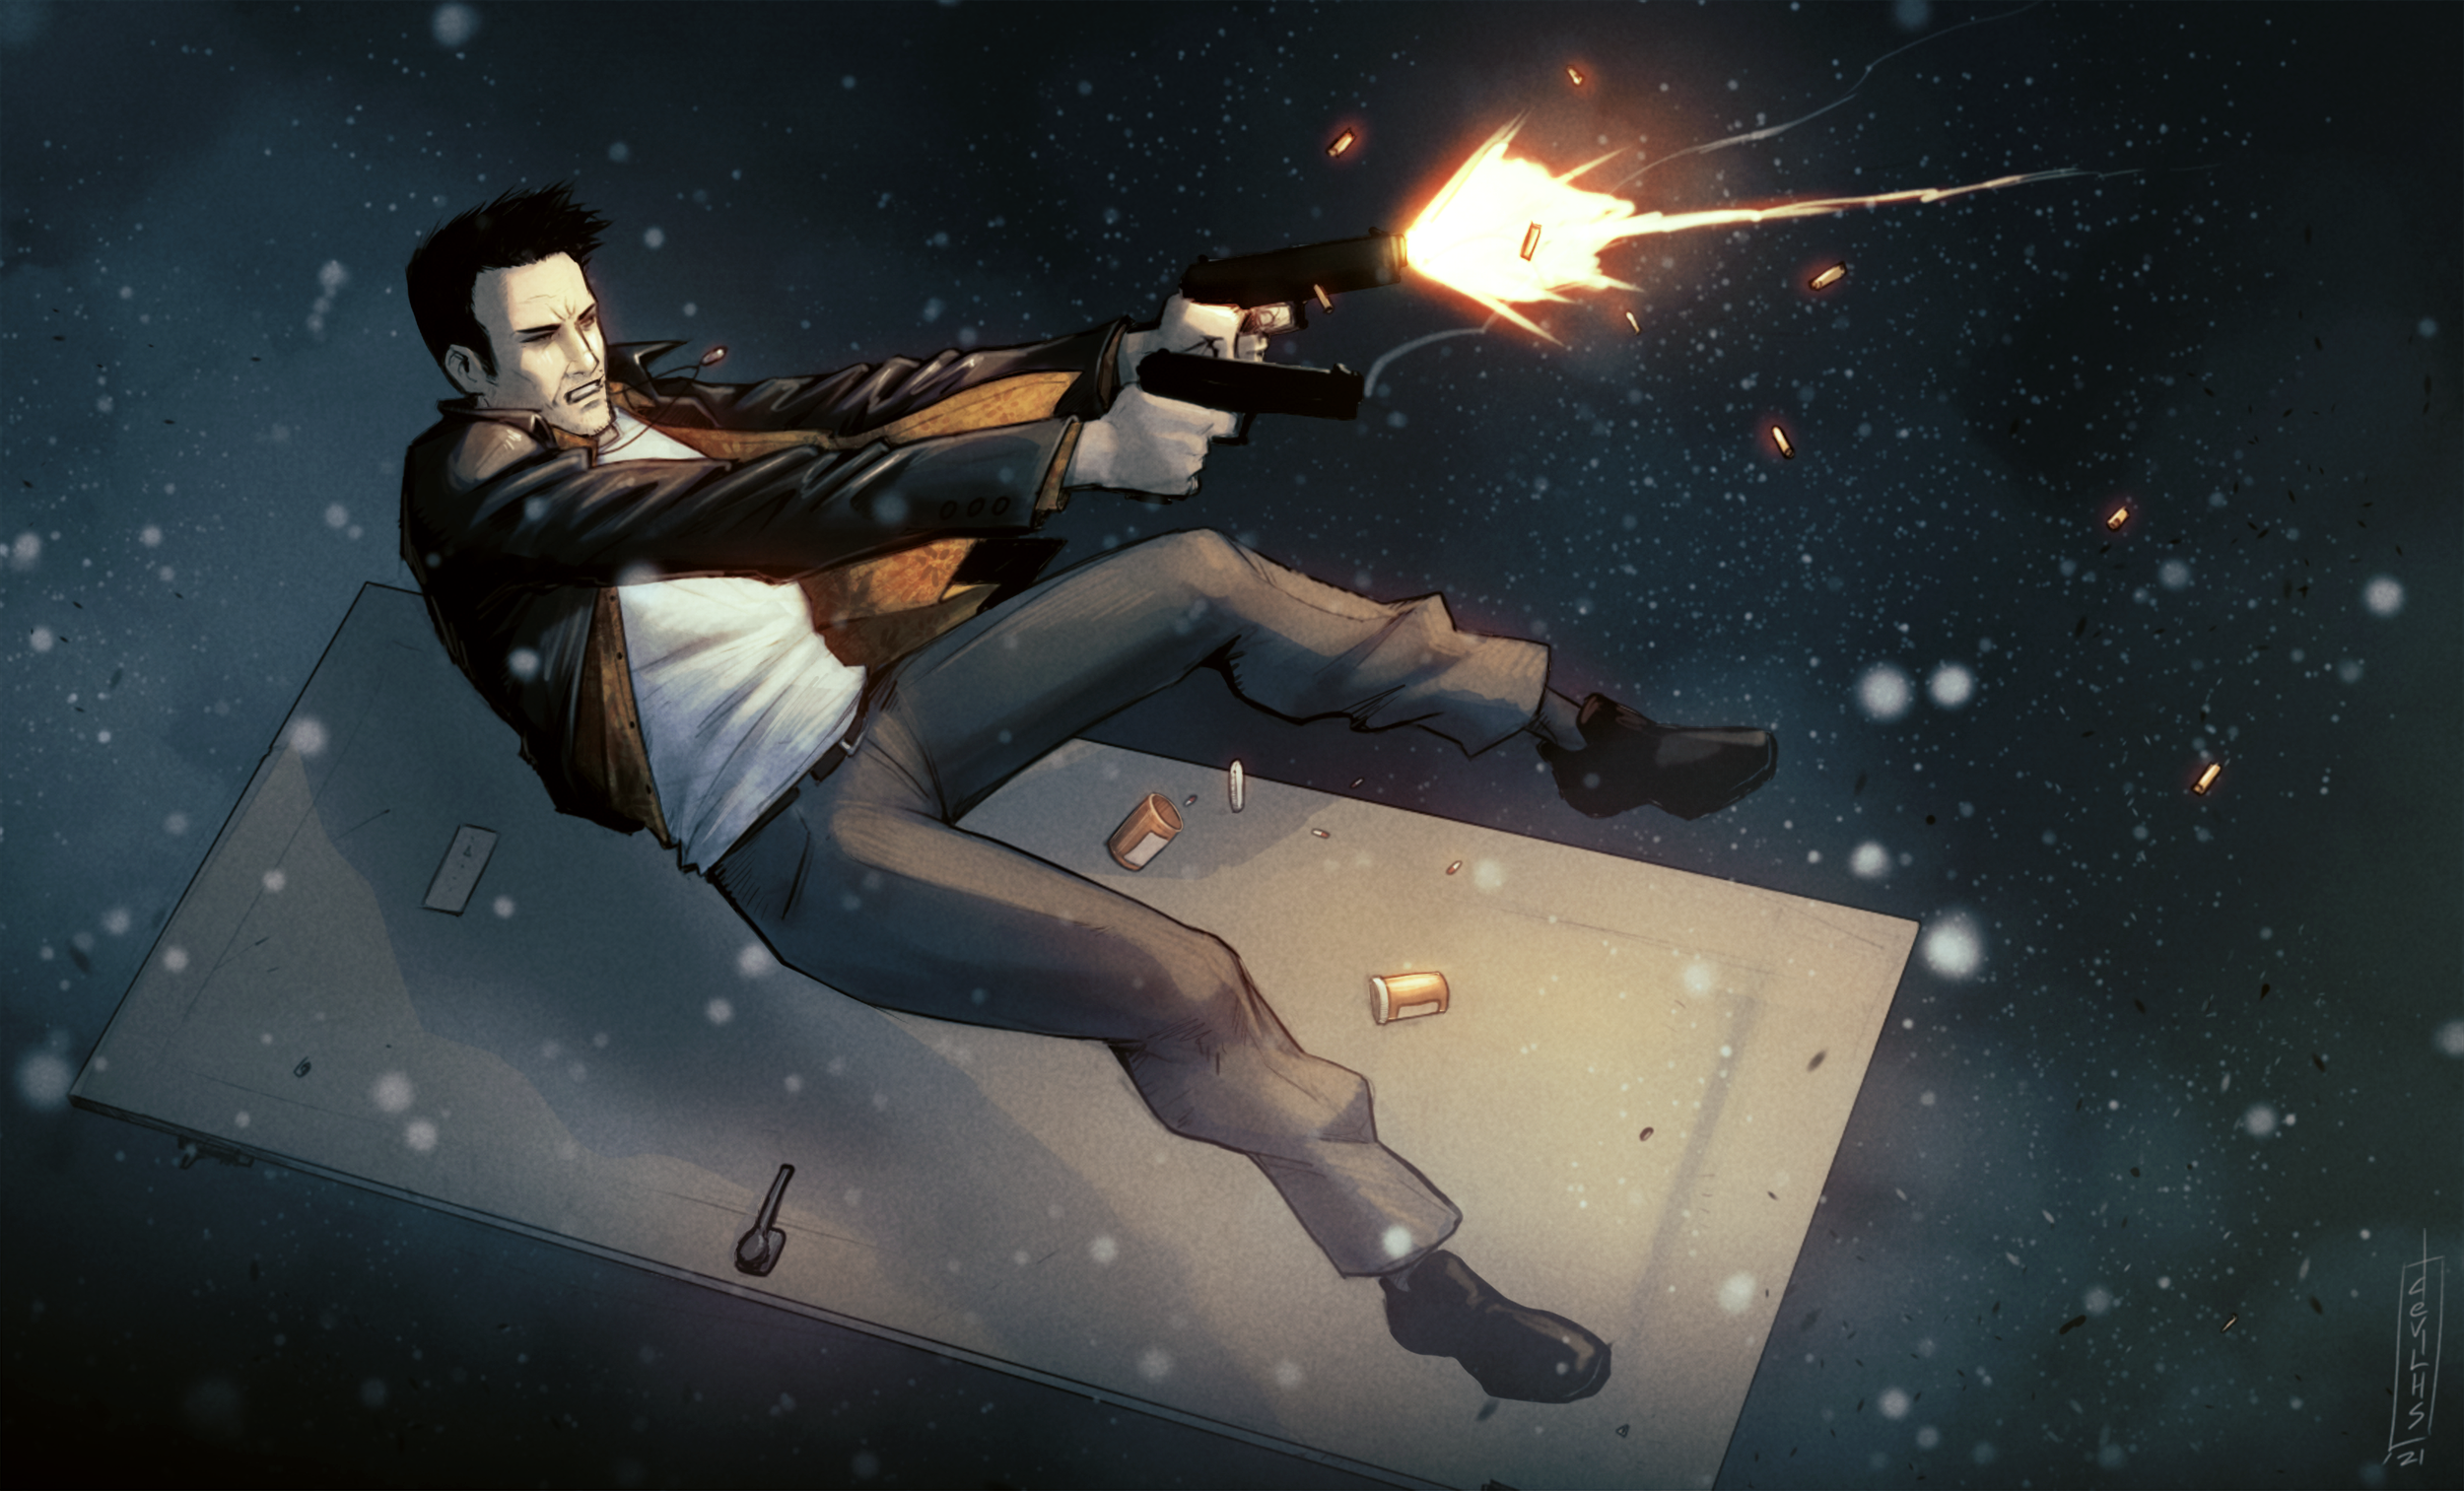 Happy birthday, Max Payne